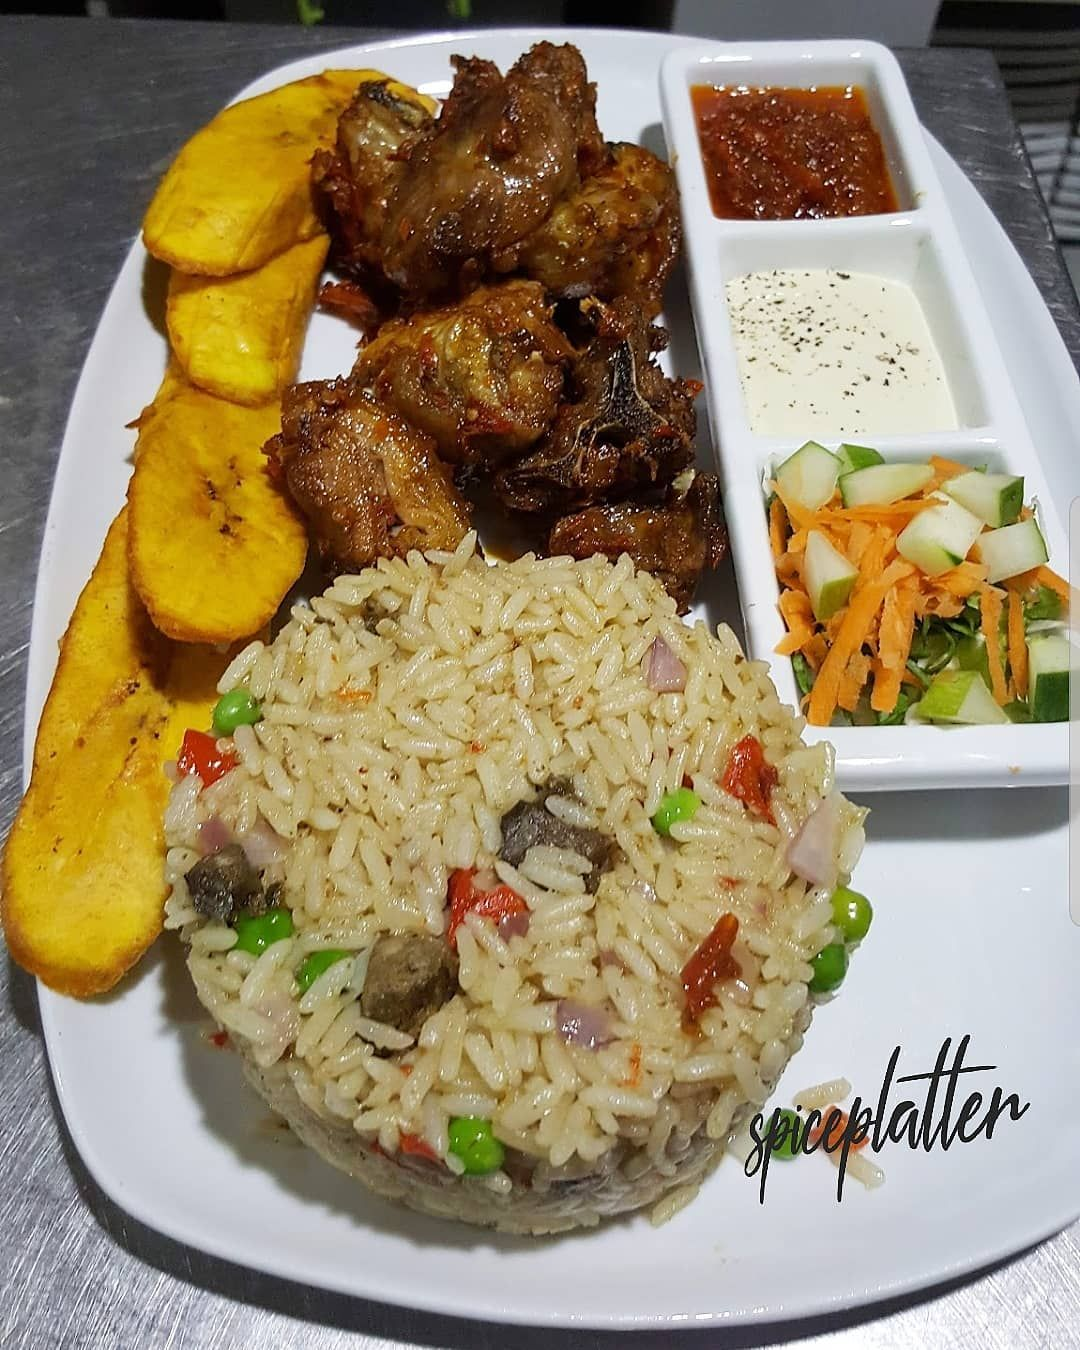 Spice Platter Abuja On Instagram Coconut Rice With Peppered Goatmeat Spiceplatter Spiceplatter Coconutrice Goatmeat Abuj Coconut Rice Food African Food